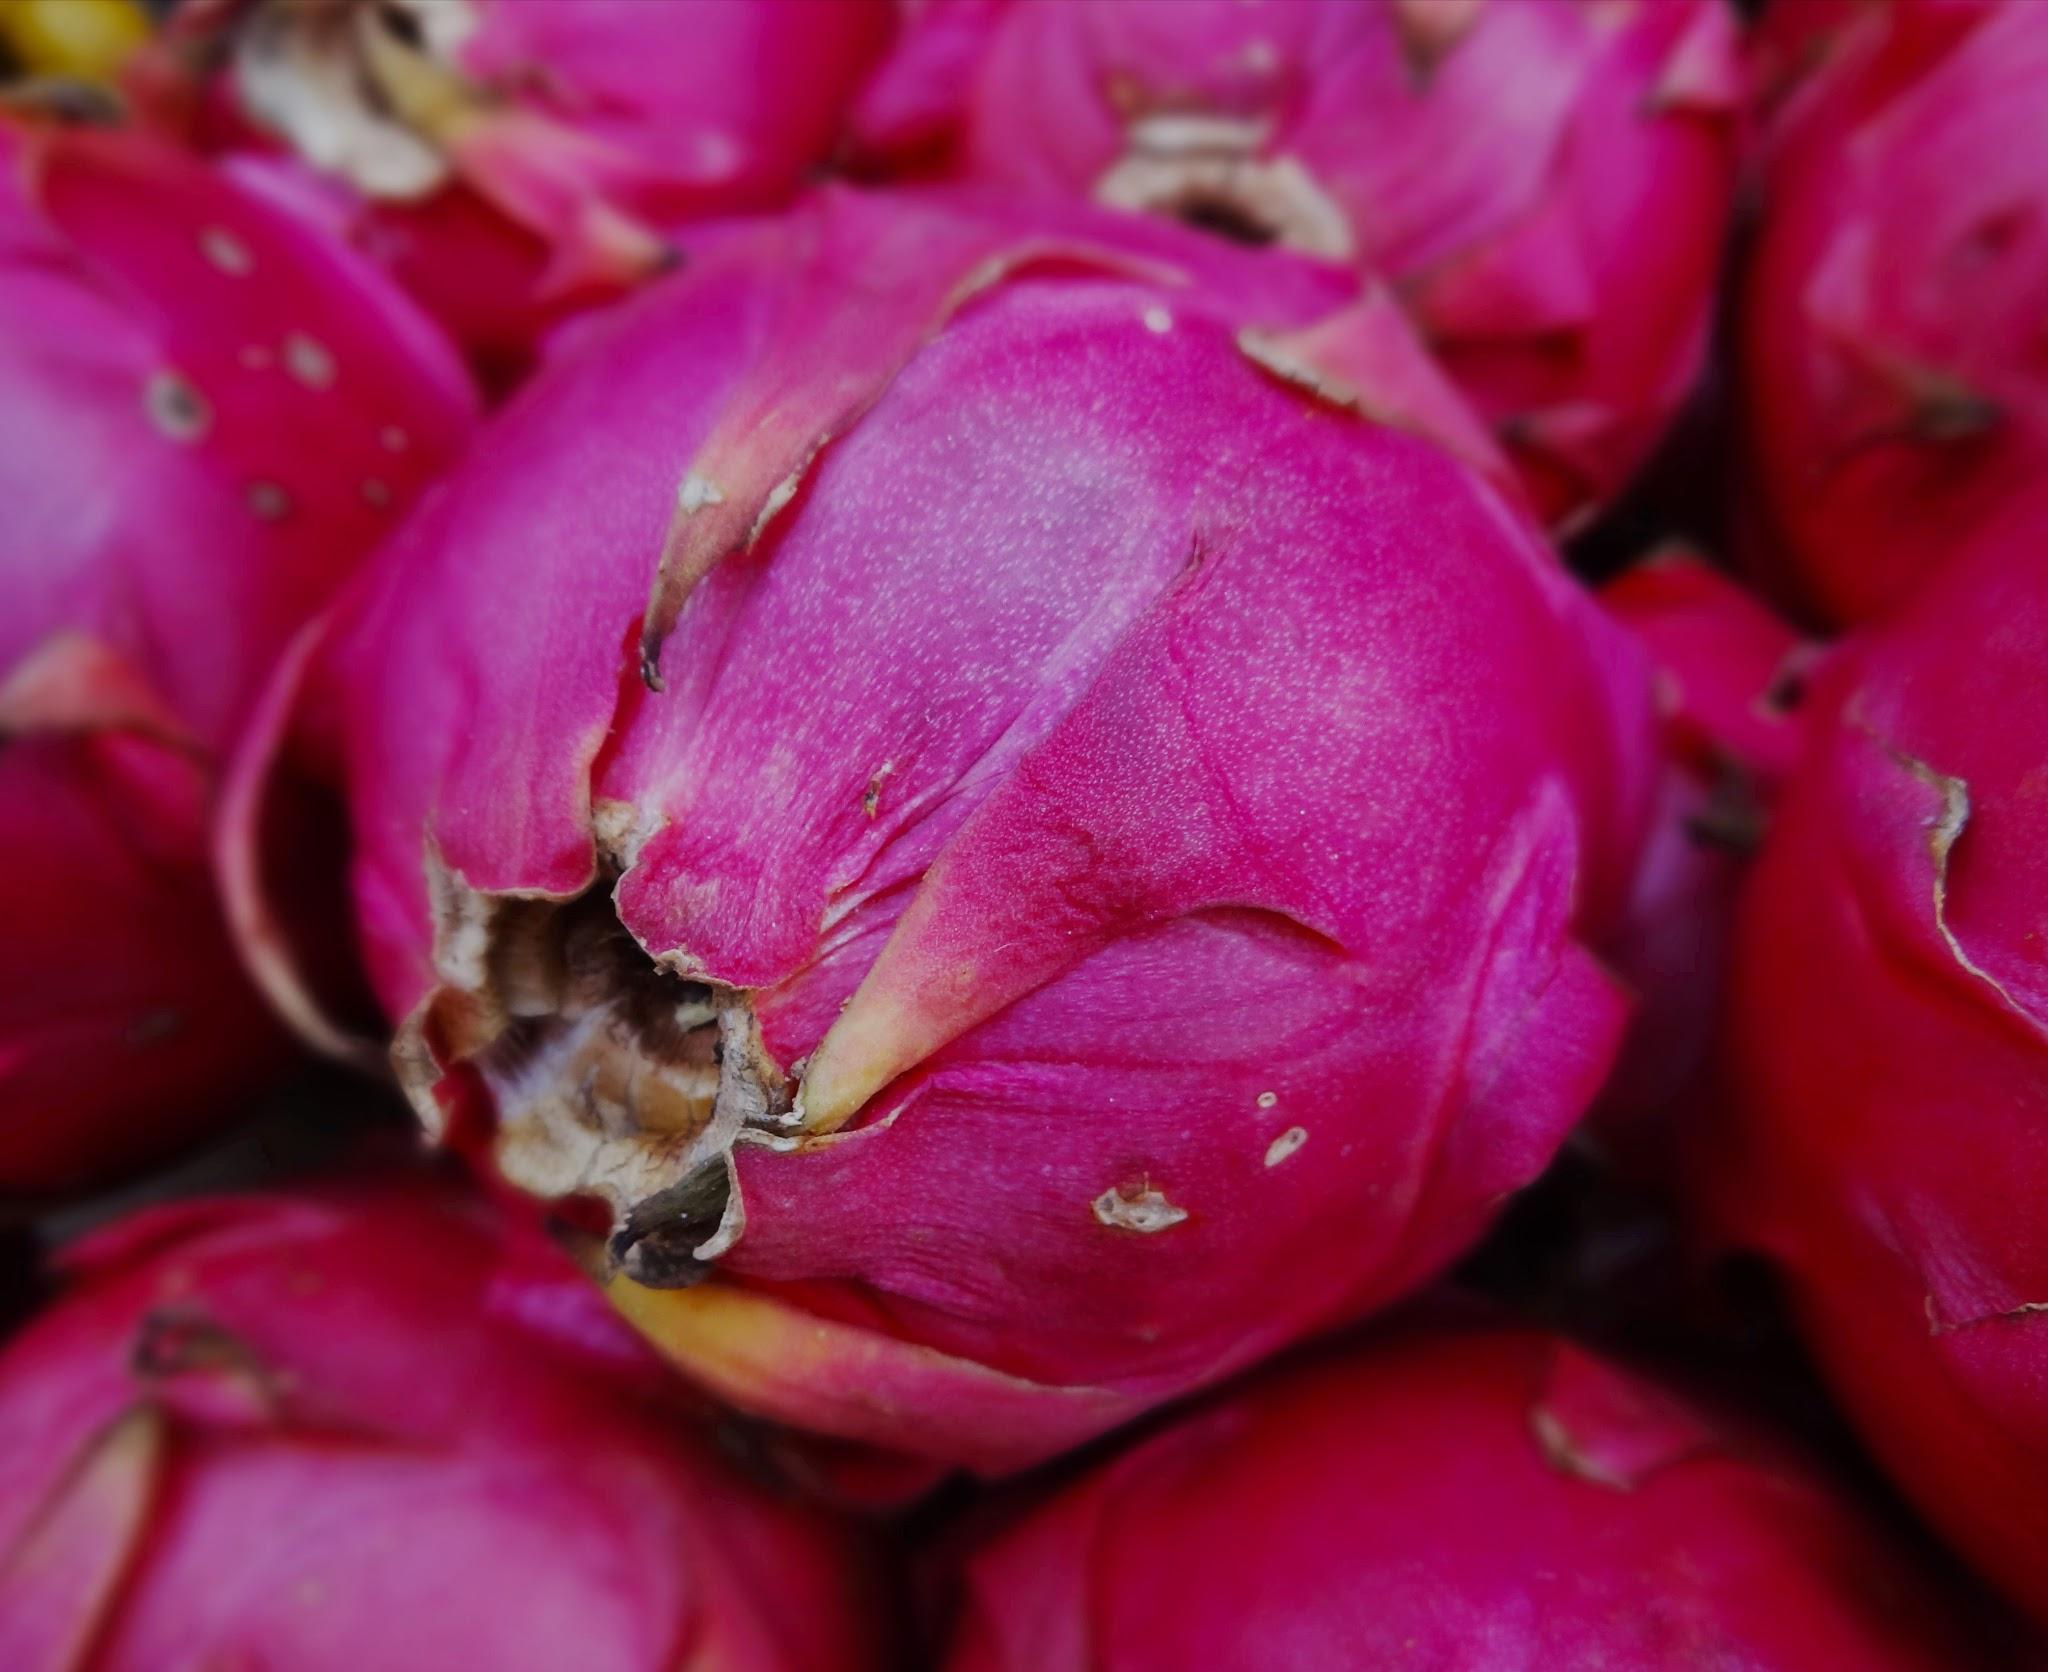 pink dragon fruit in Kuala Lumpur